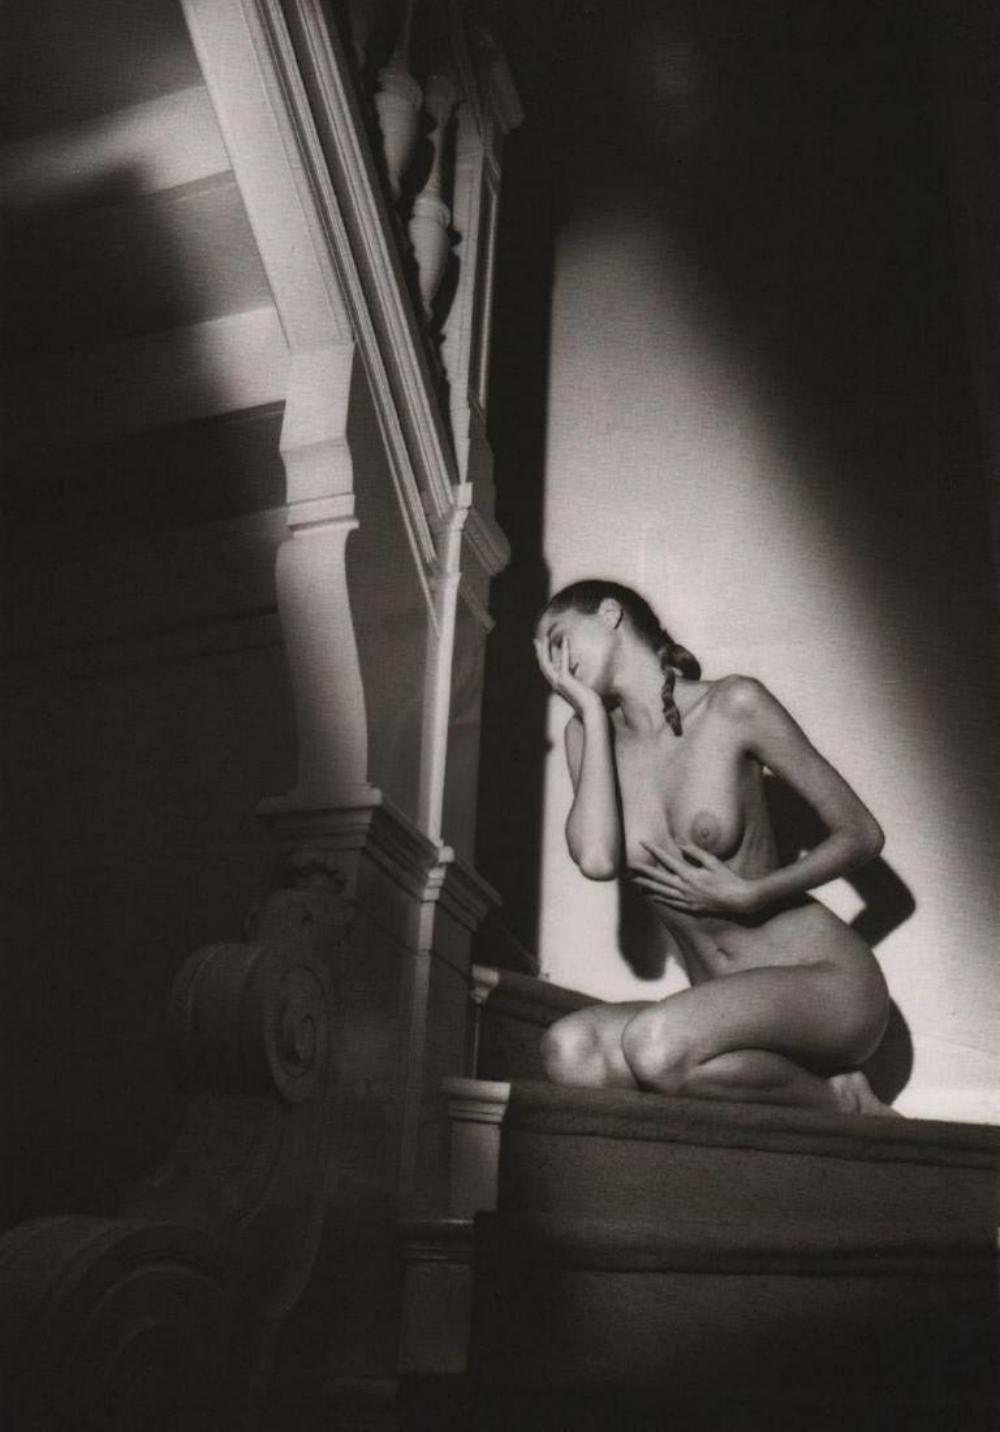 JEANLOUP SIEFF, NUDE ON STAIRS PARIS 1987